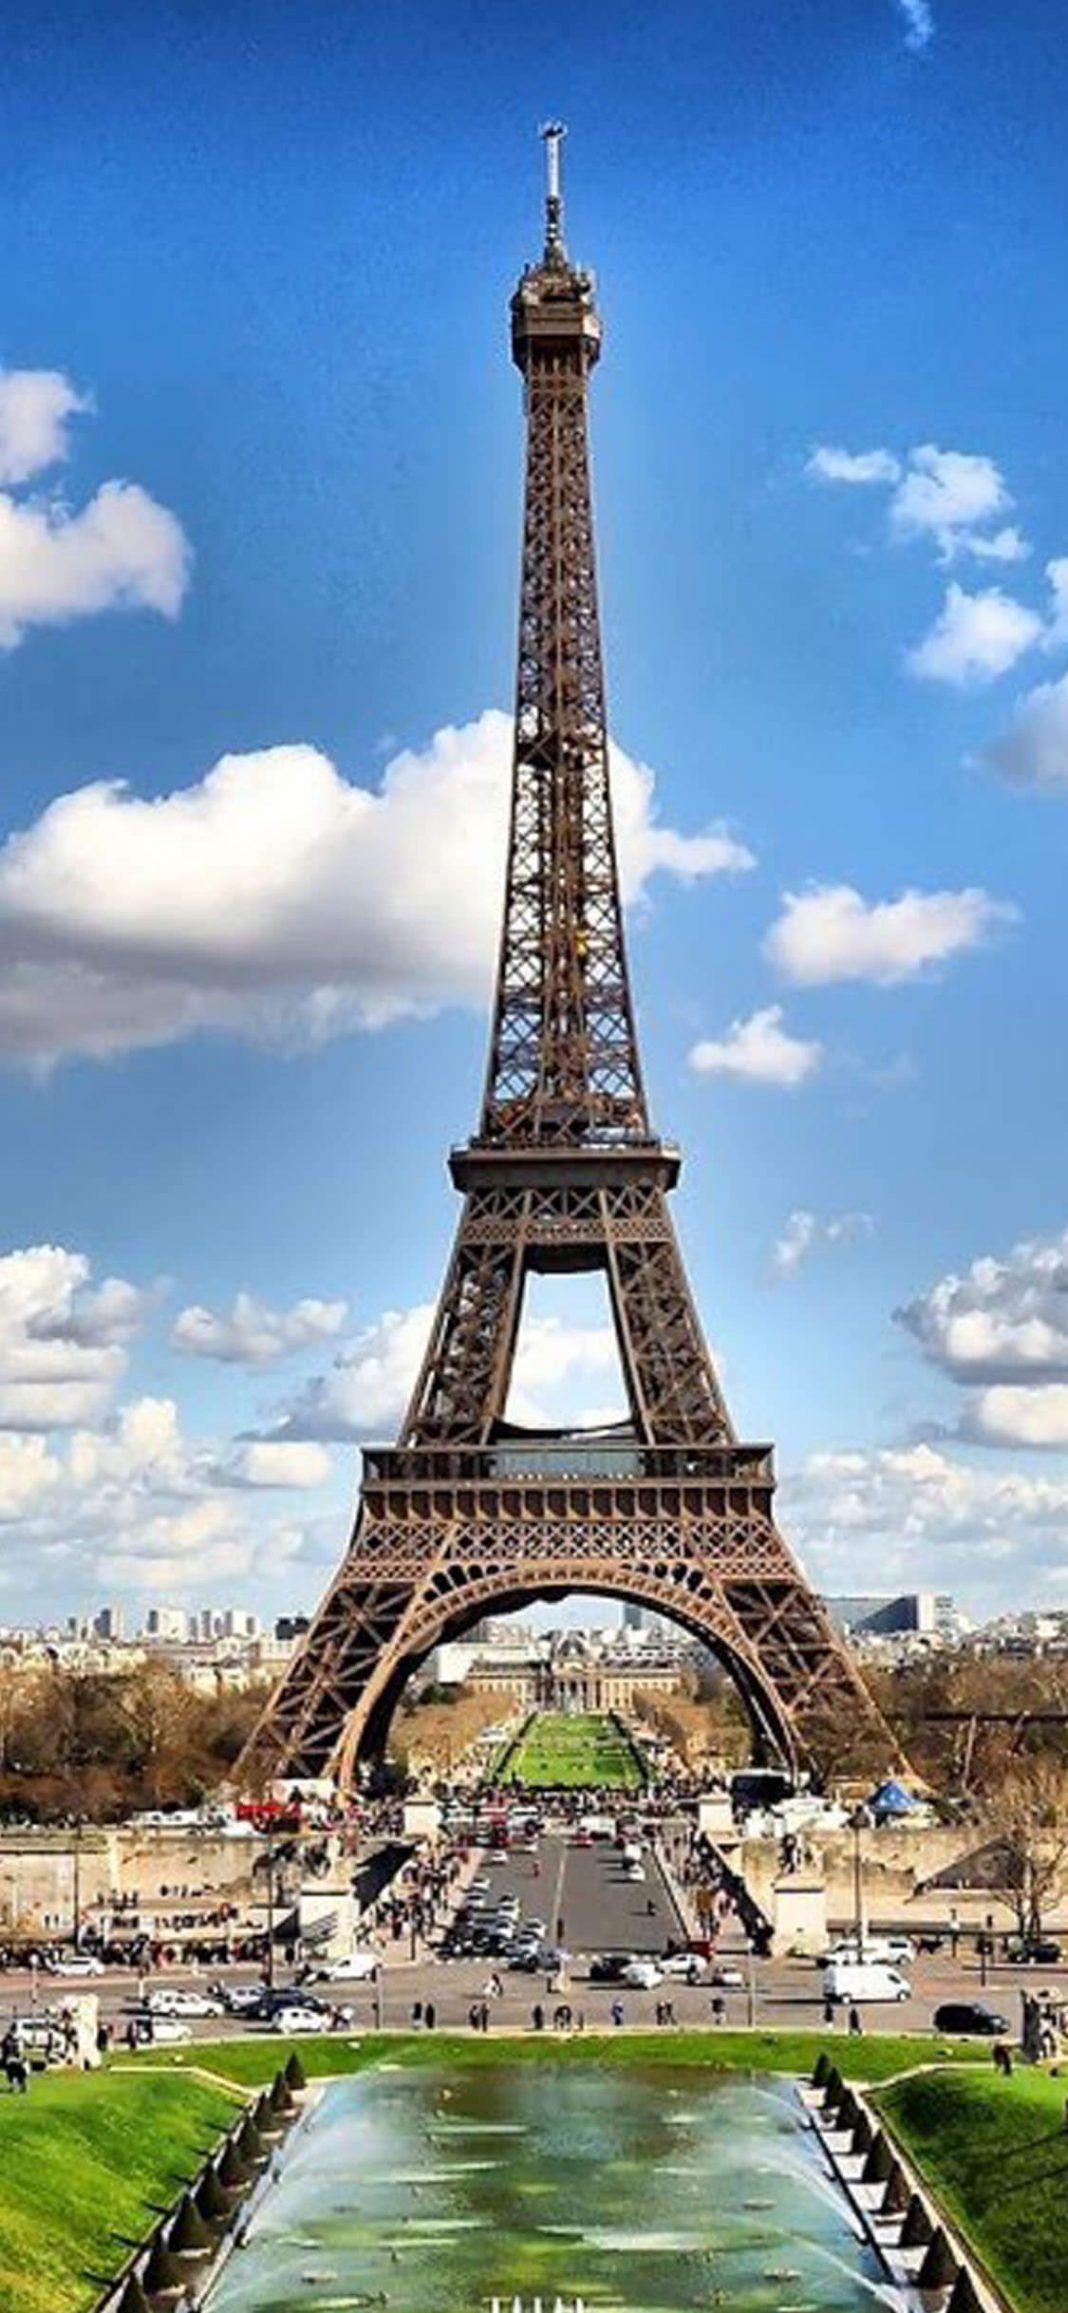 1125 2436 Eiffel 4k Iphone Xs Wallpaper Wallpaper Backgrounds Background 4k Wallpaper Iphone